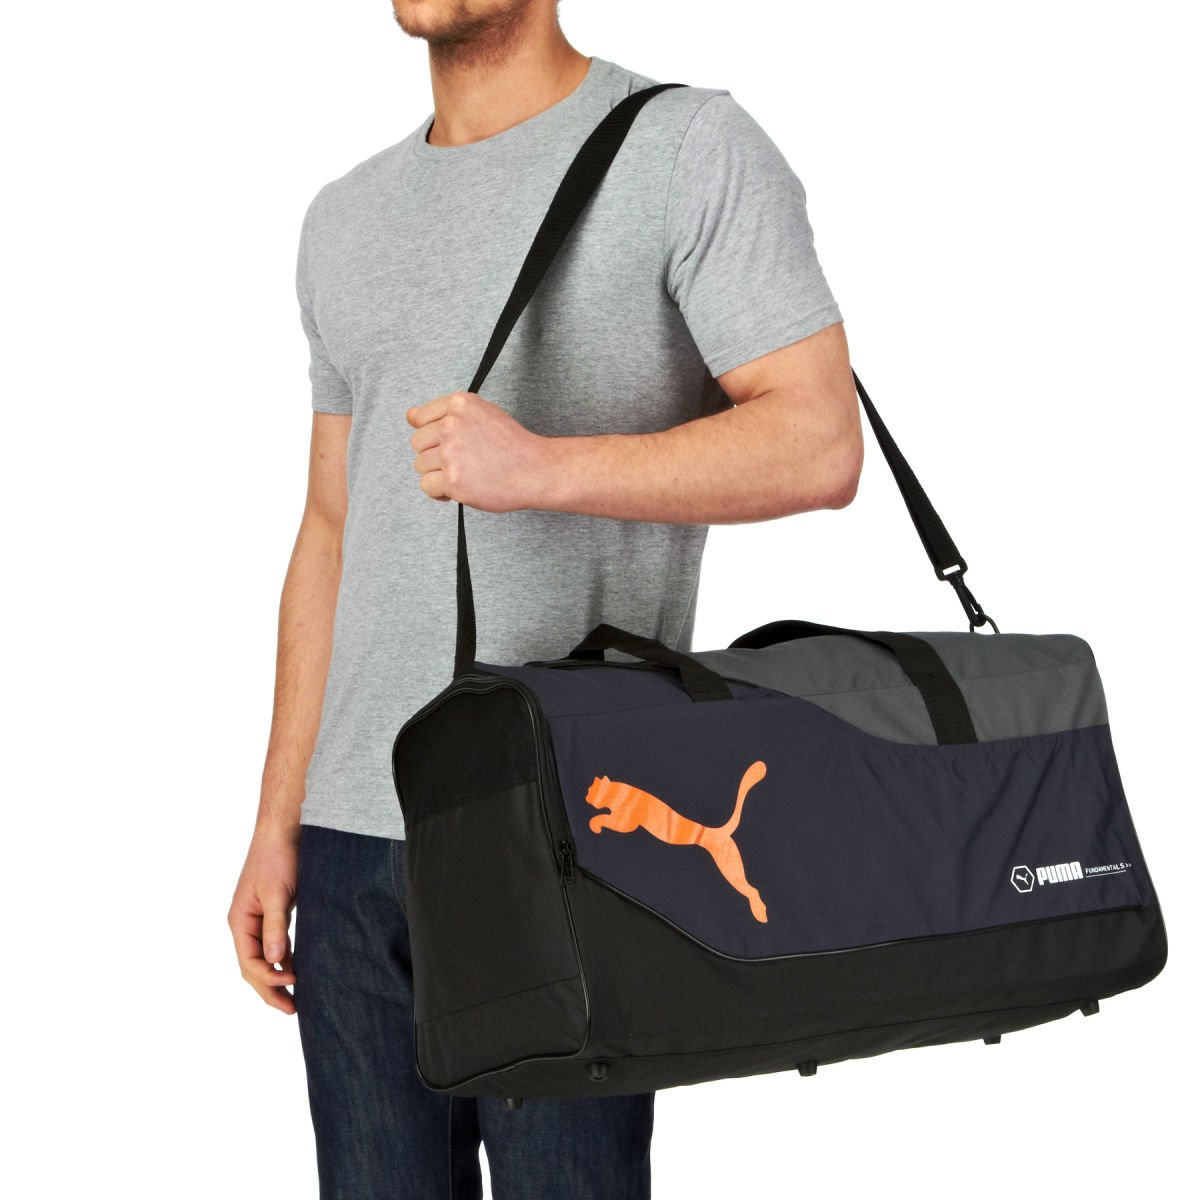 puma fundamentals medium sports bag Sale ce0095f89e13b